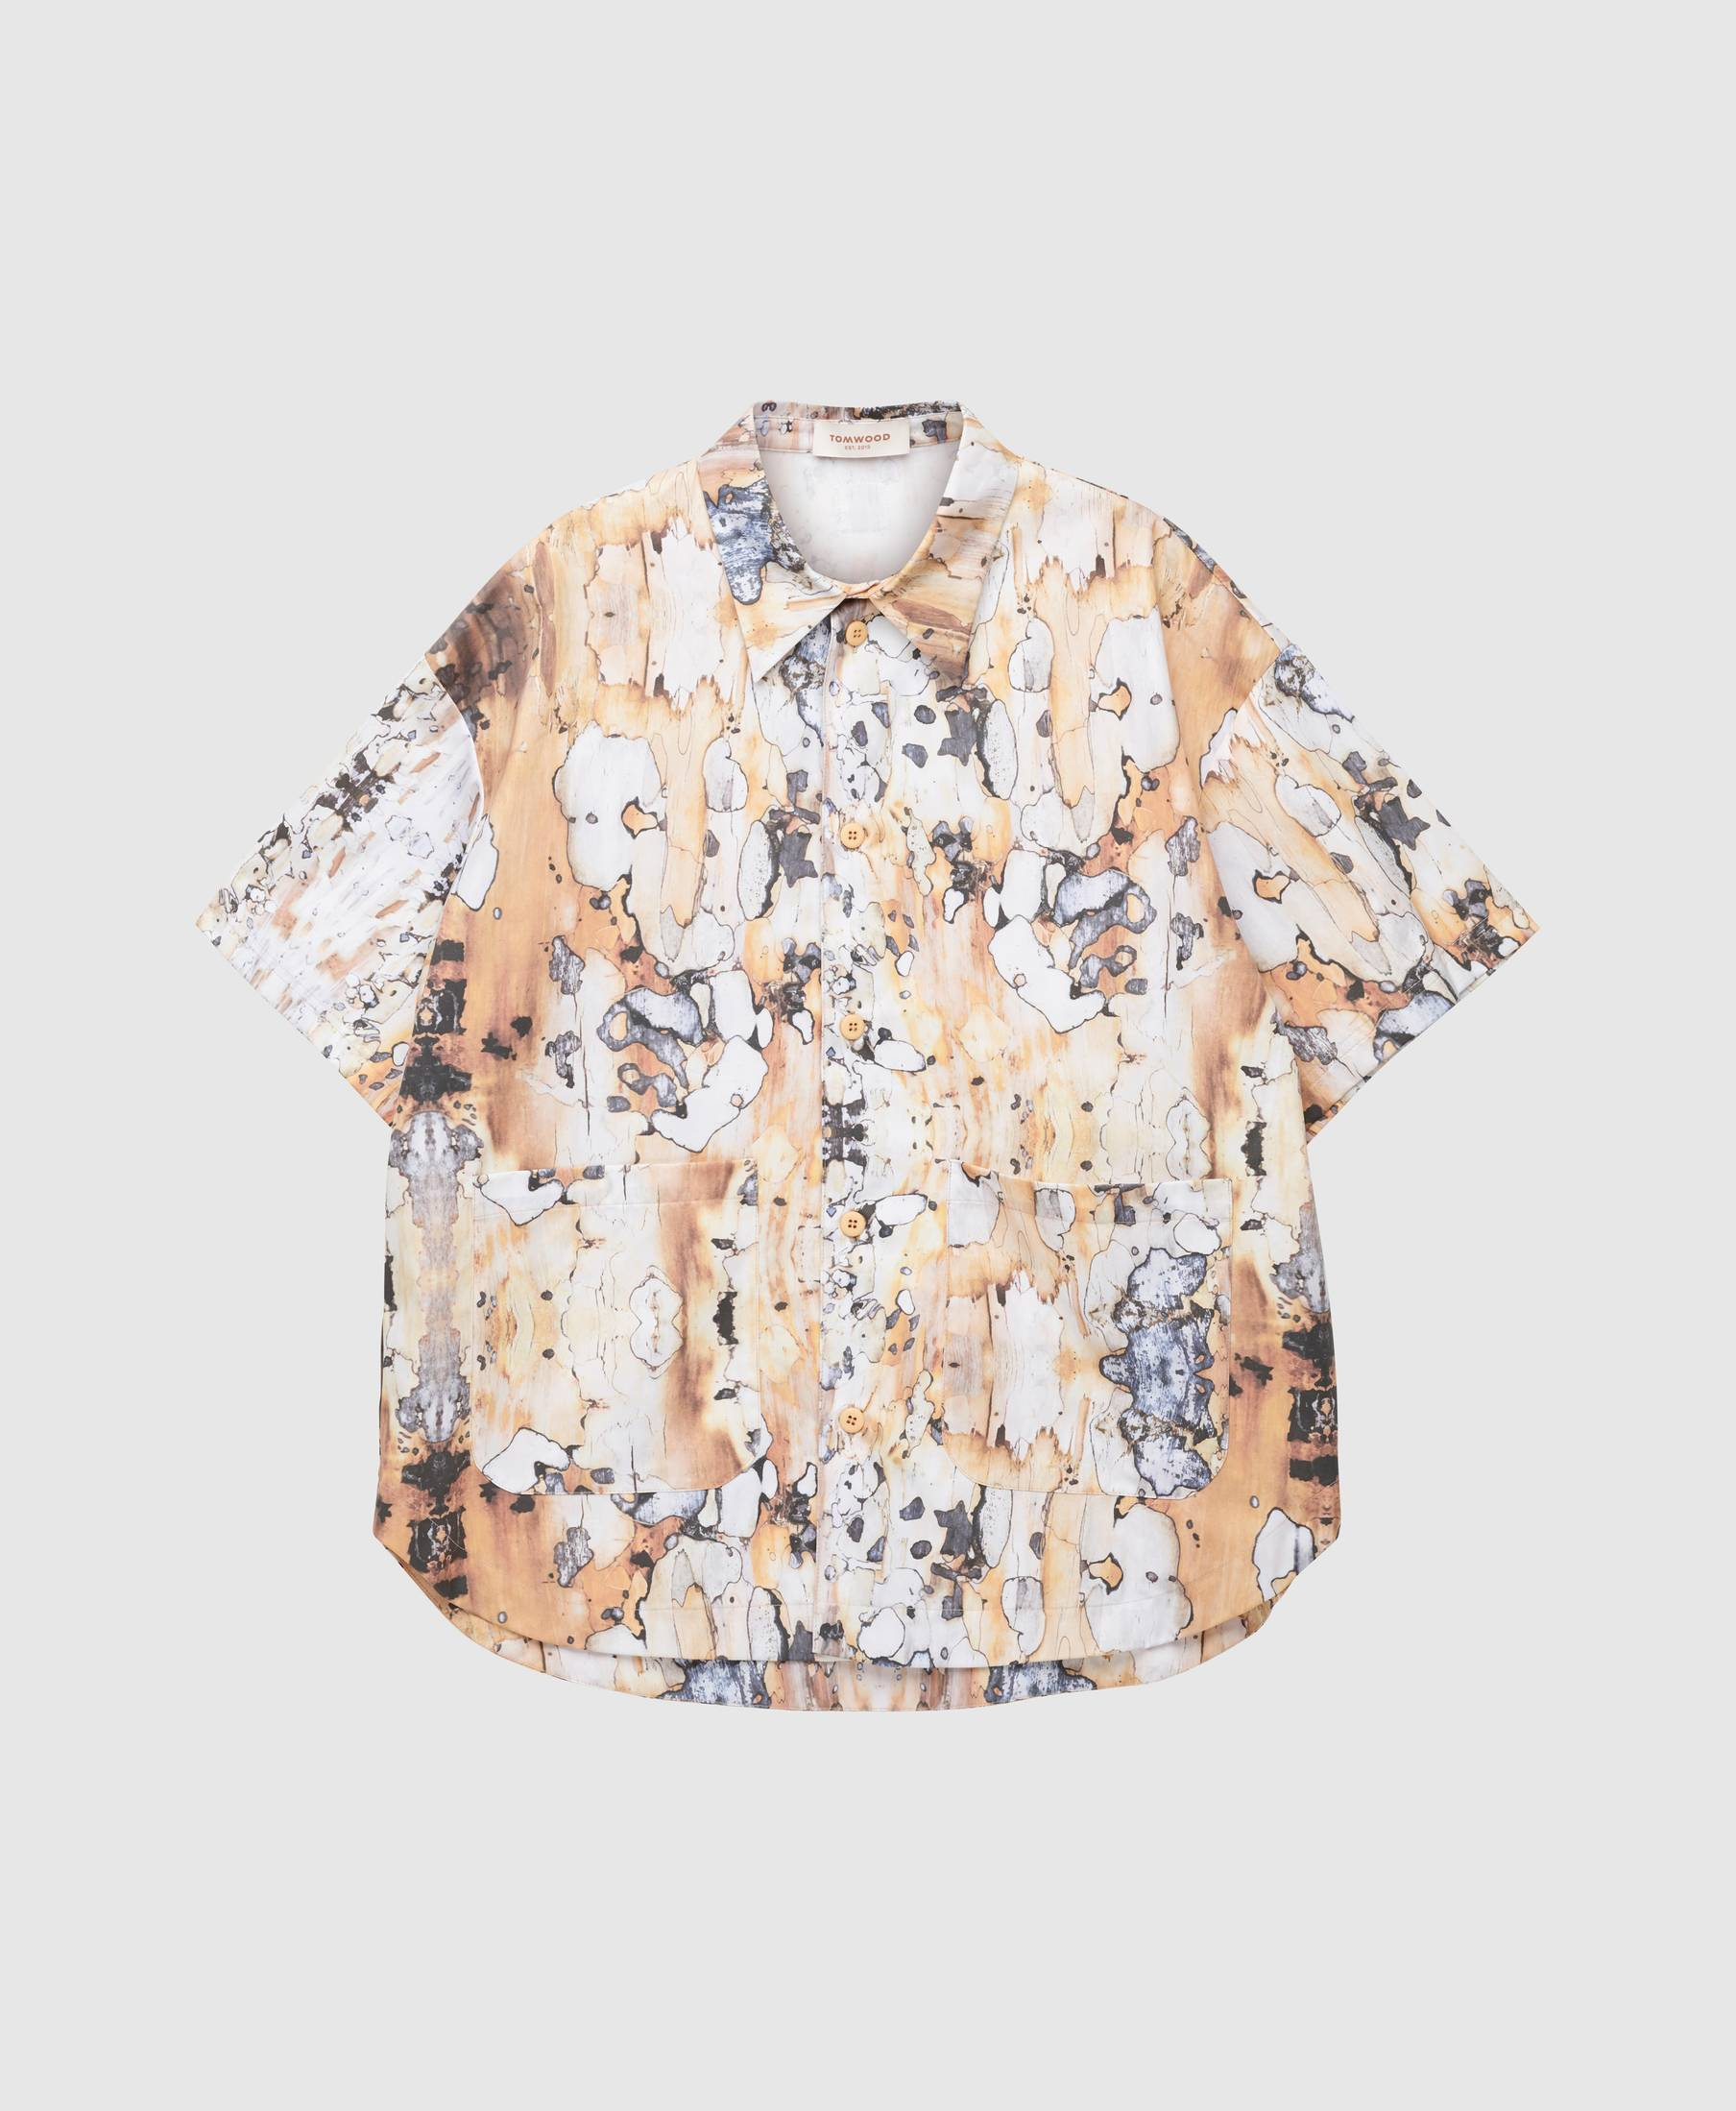 Stardust Shirt Earthy Marble